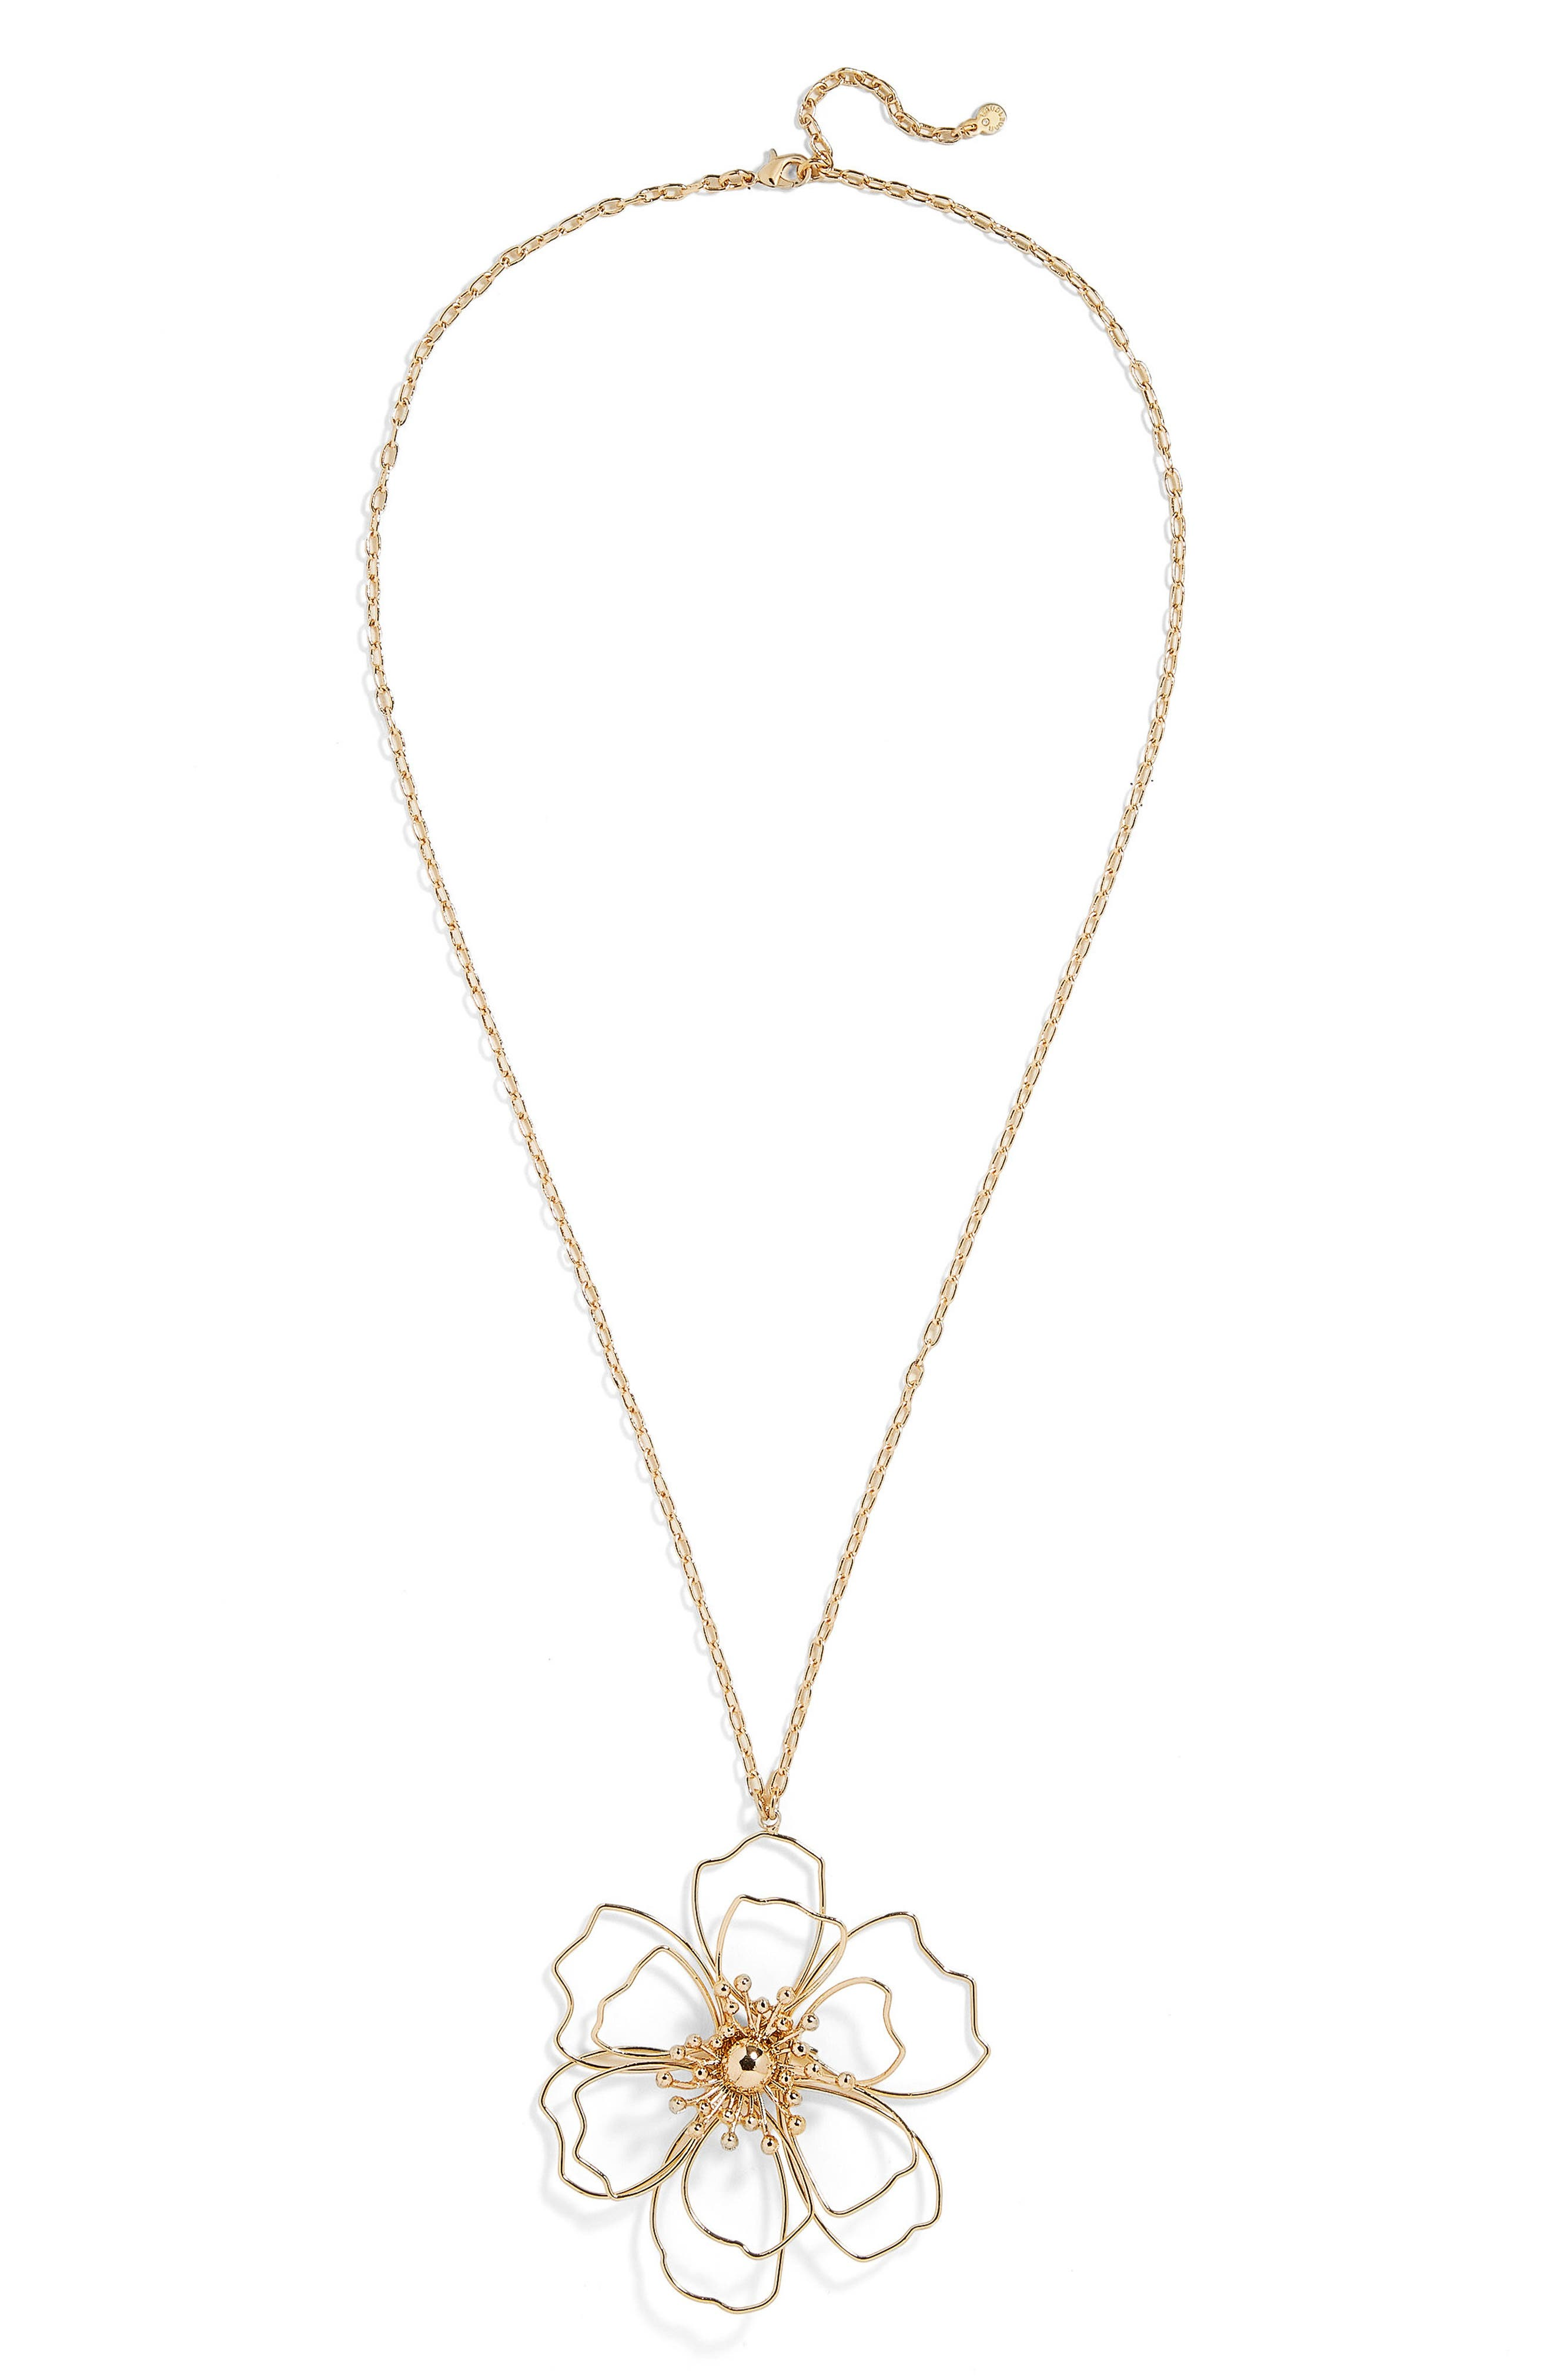 Blossom Pendant Necklace,                             Main thumbnail 1, color,                             Gold